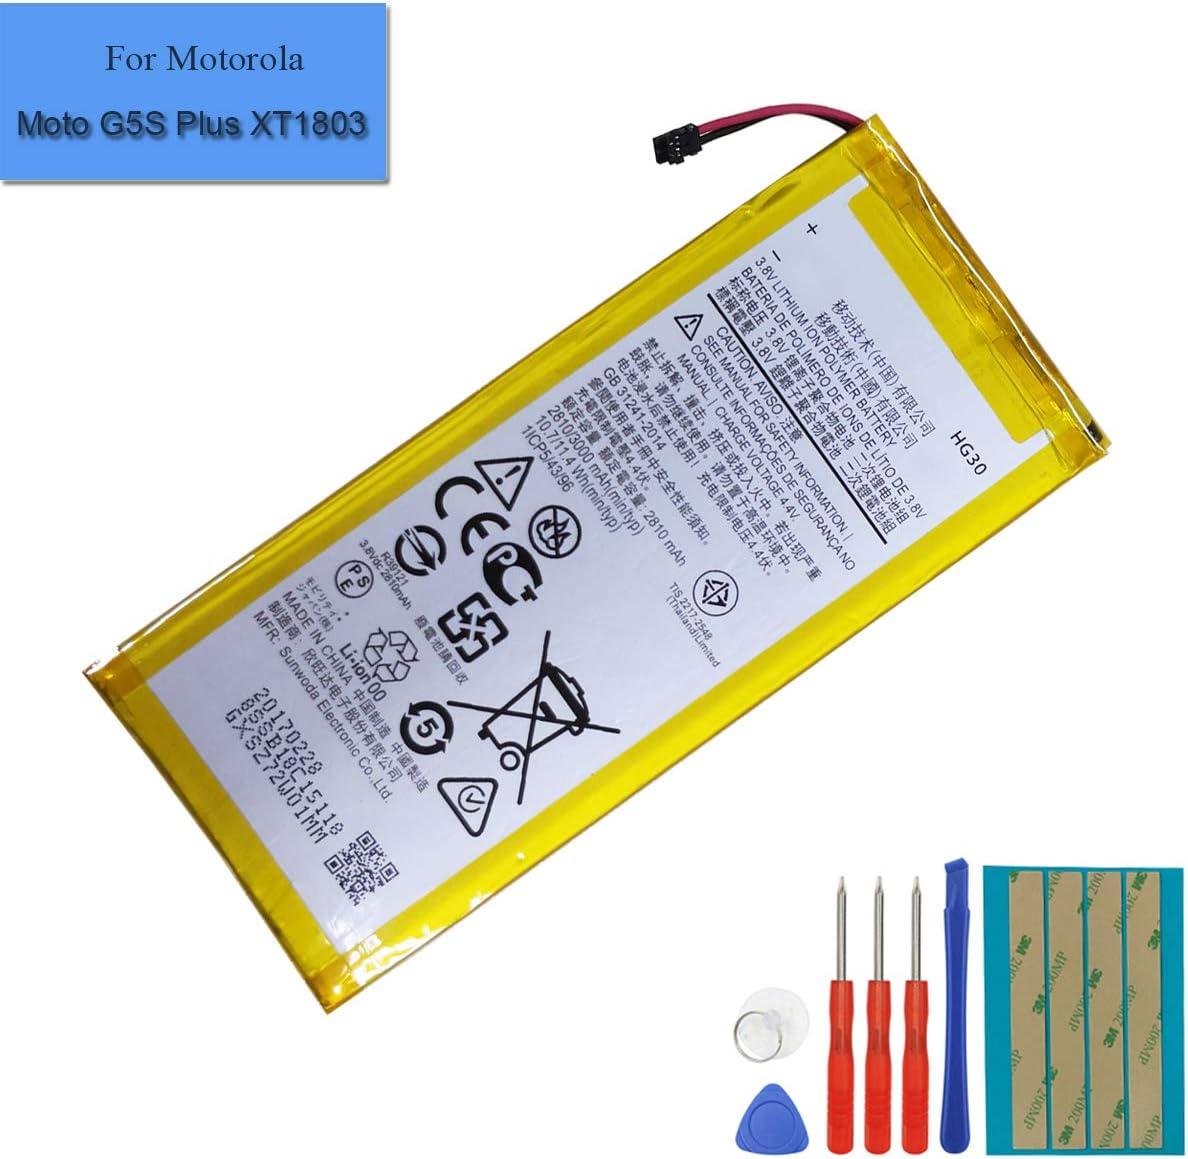 for Motorola Moto G6 XT1806 Replacement Battery HG30 Free Adhesive Tool